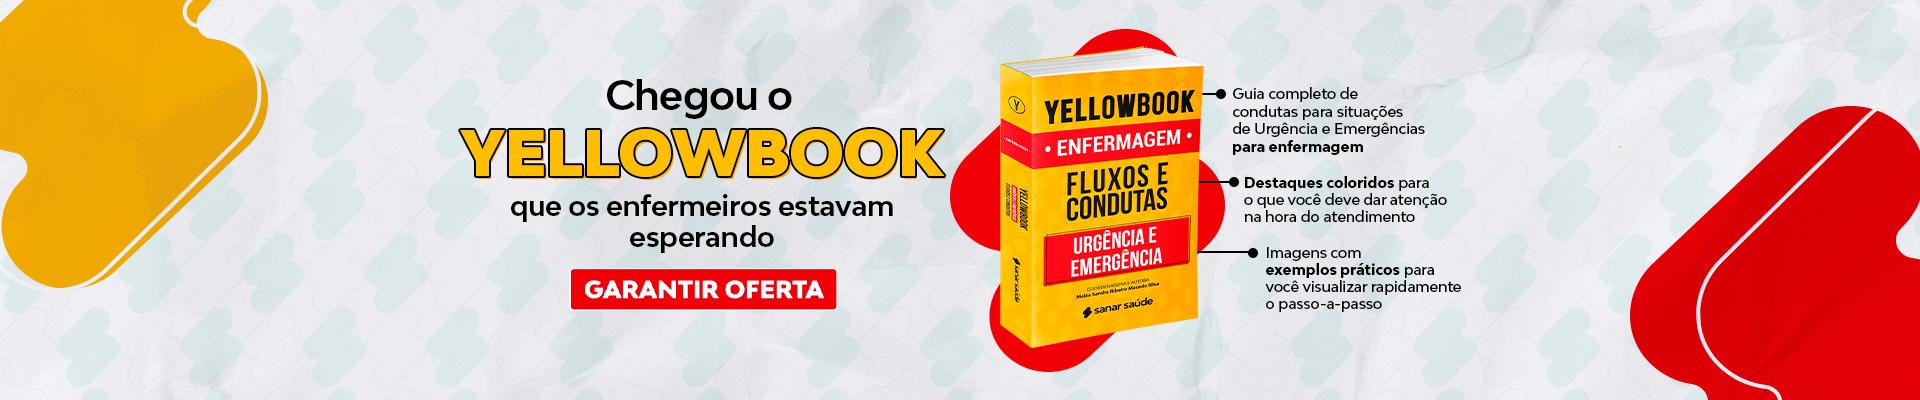 Banner Lançamento Yellowbook Enfermagem